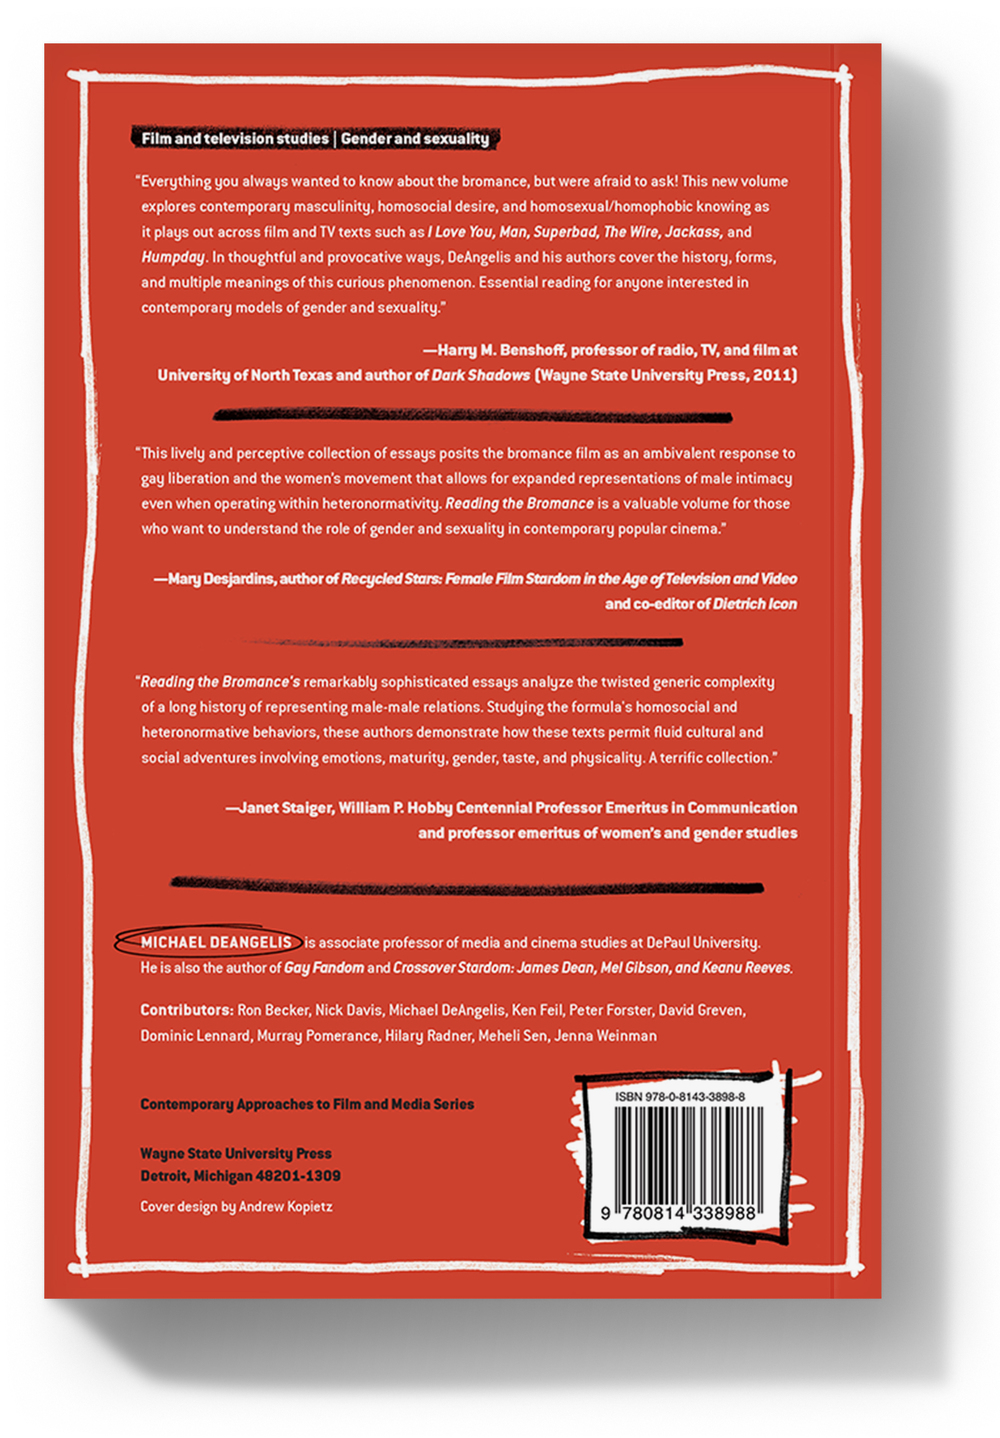 BookCover7.jpg